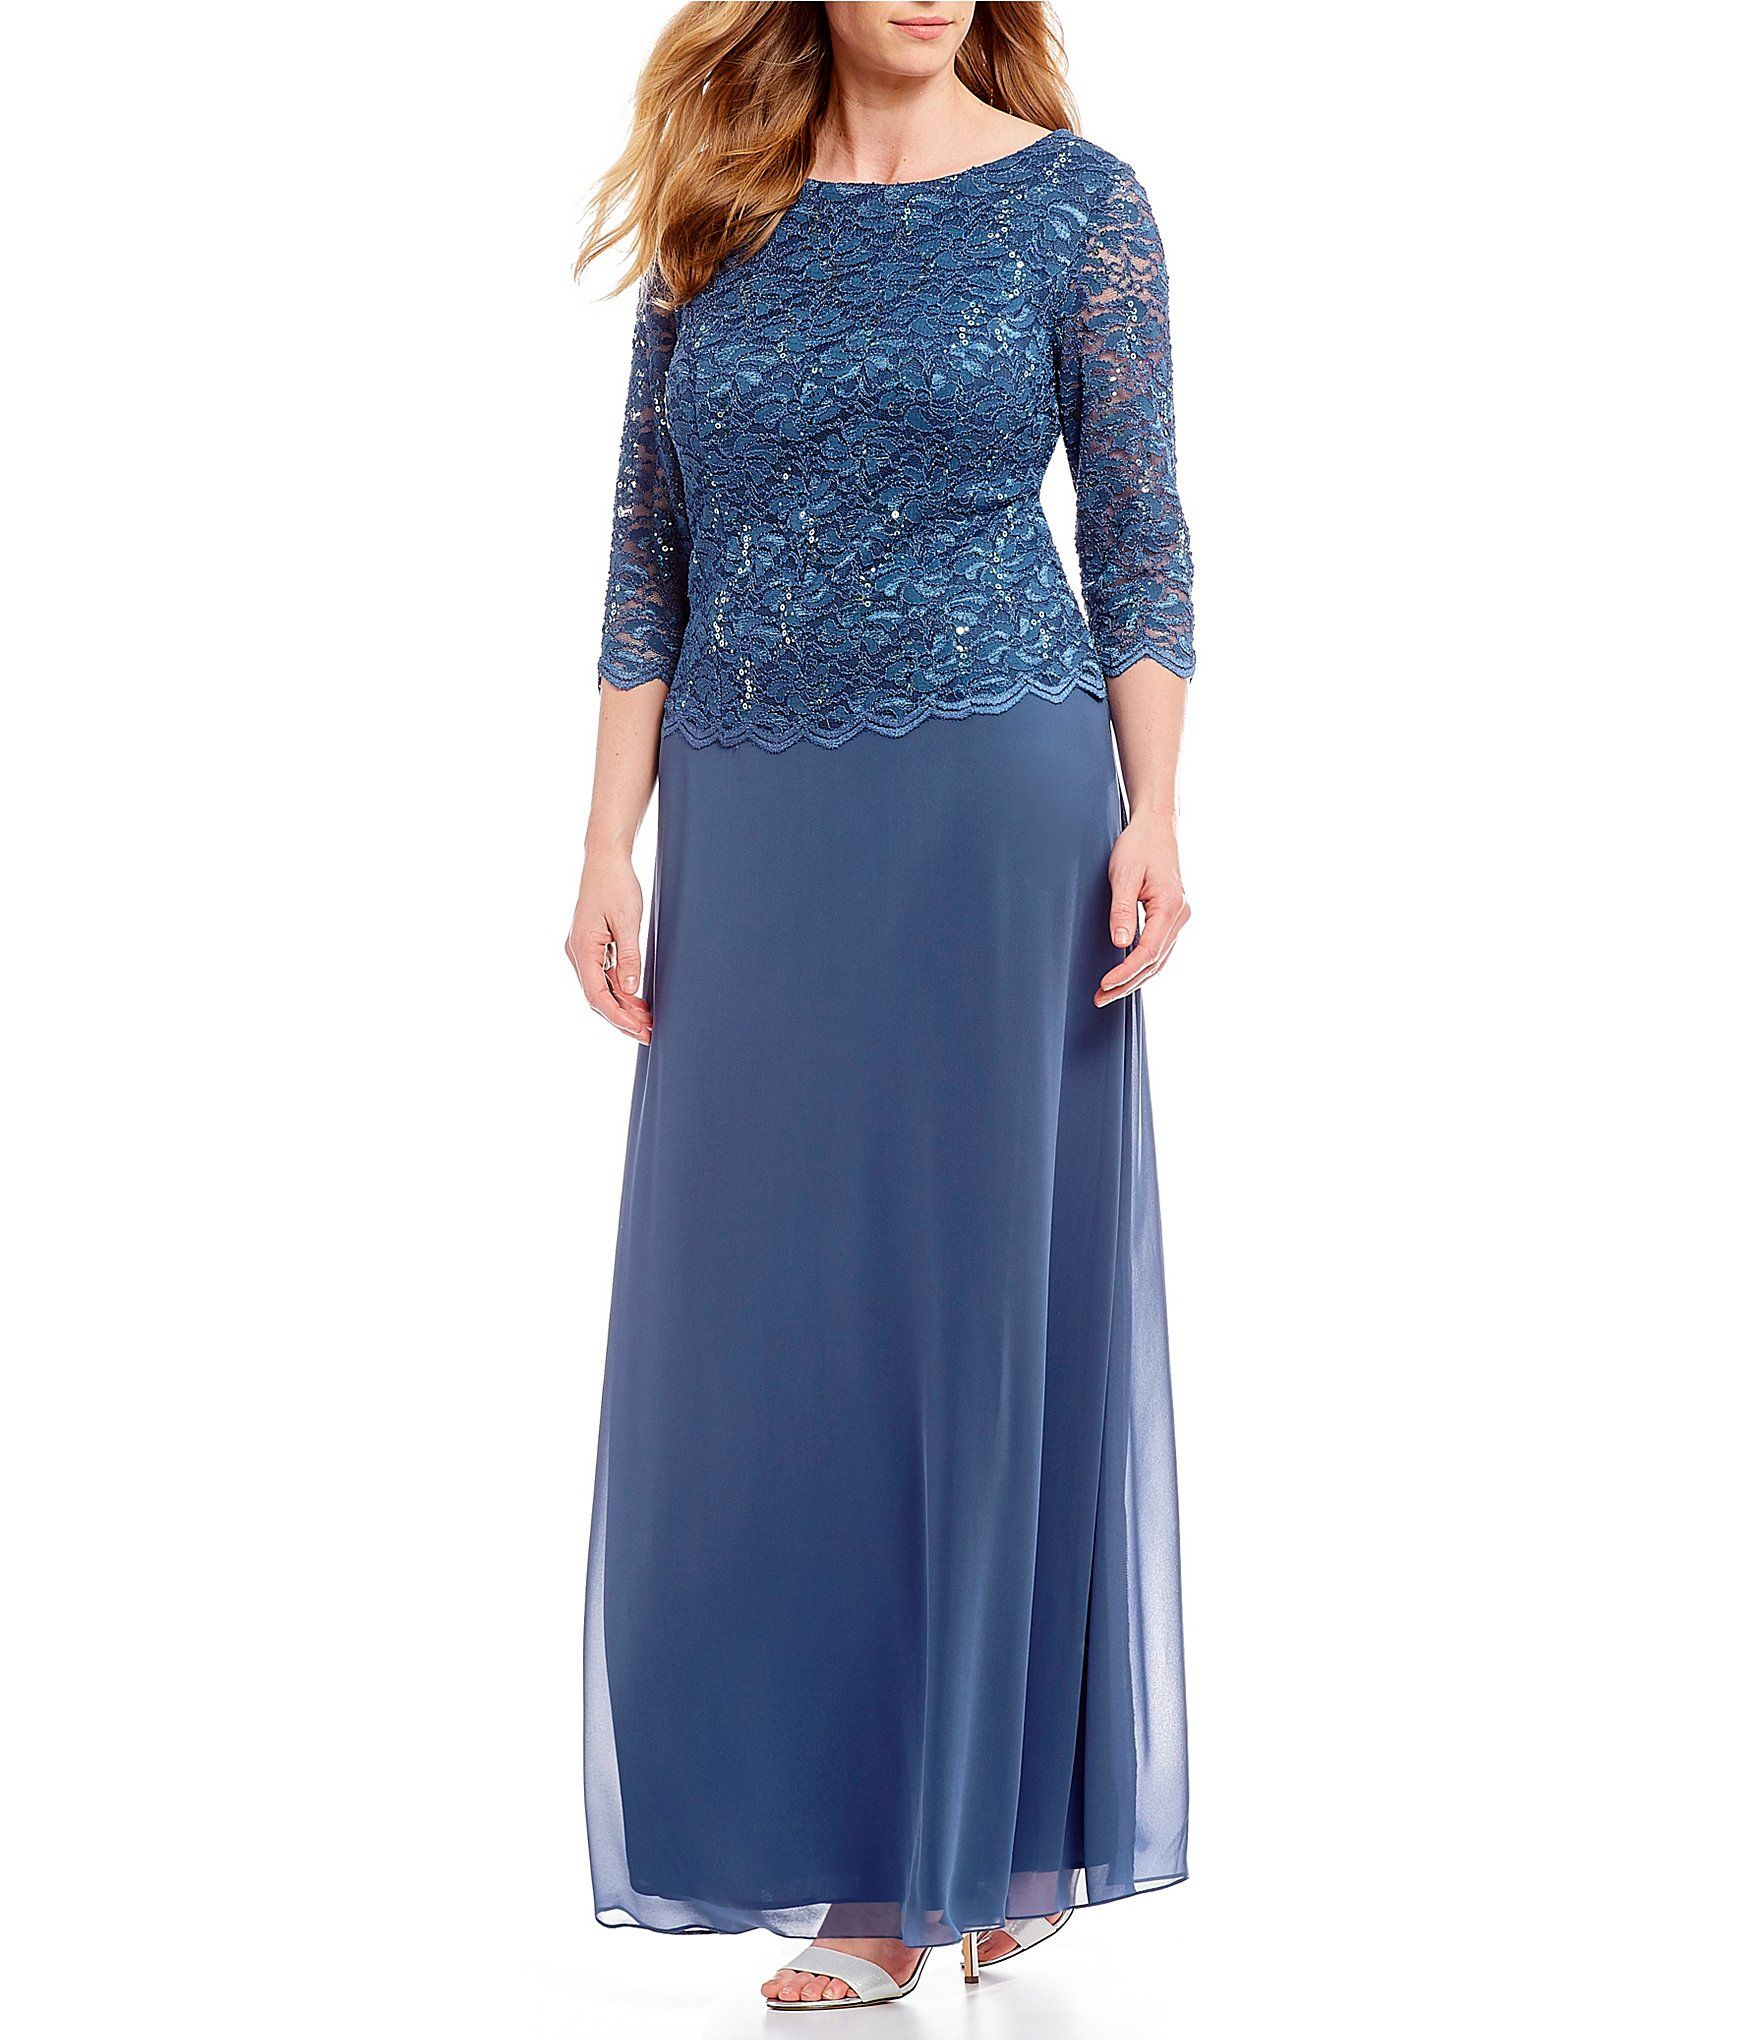 5ac75cbf40e Plus Size Prom Dresses Dillards